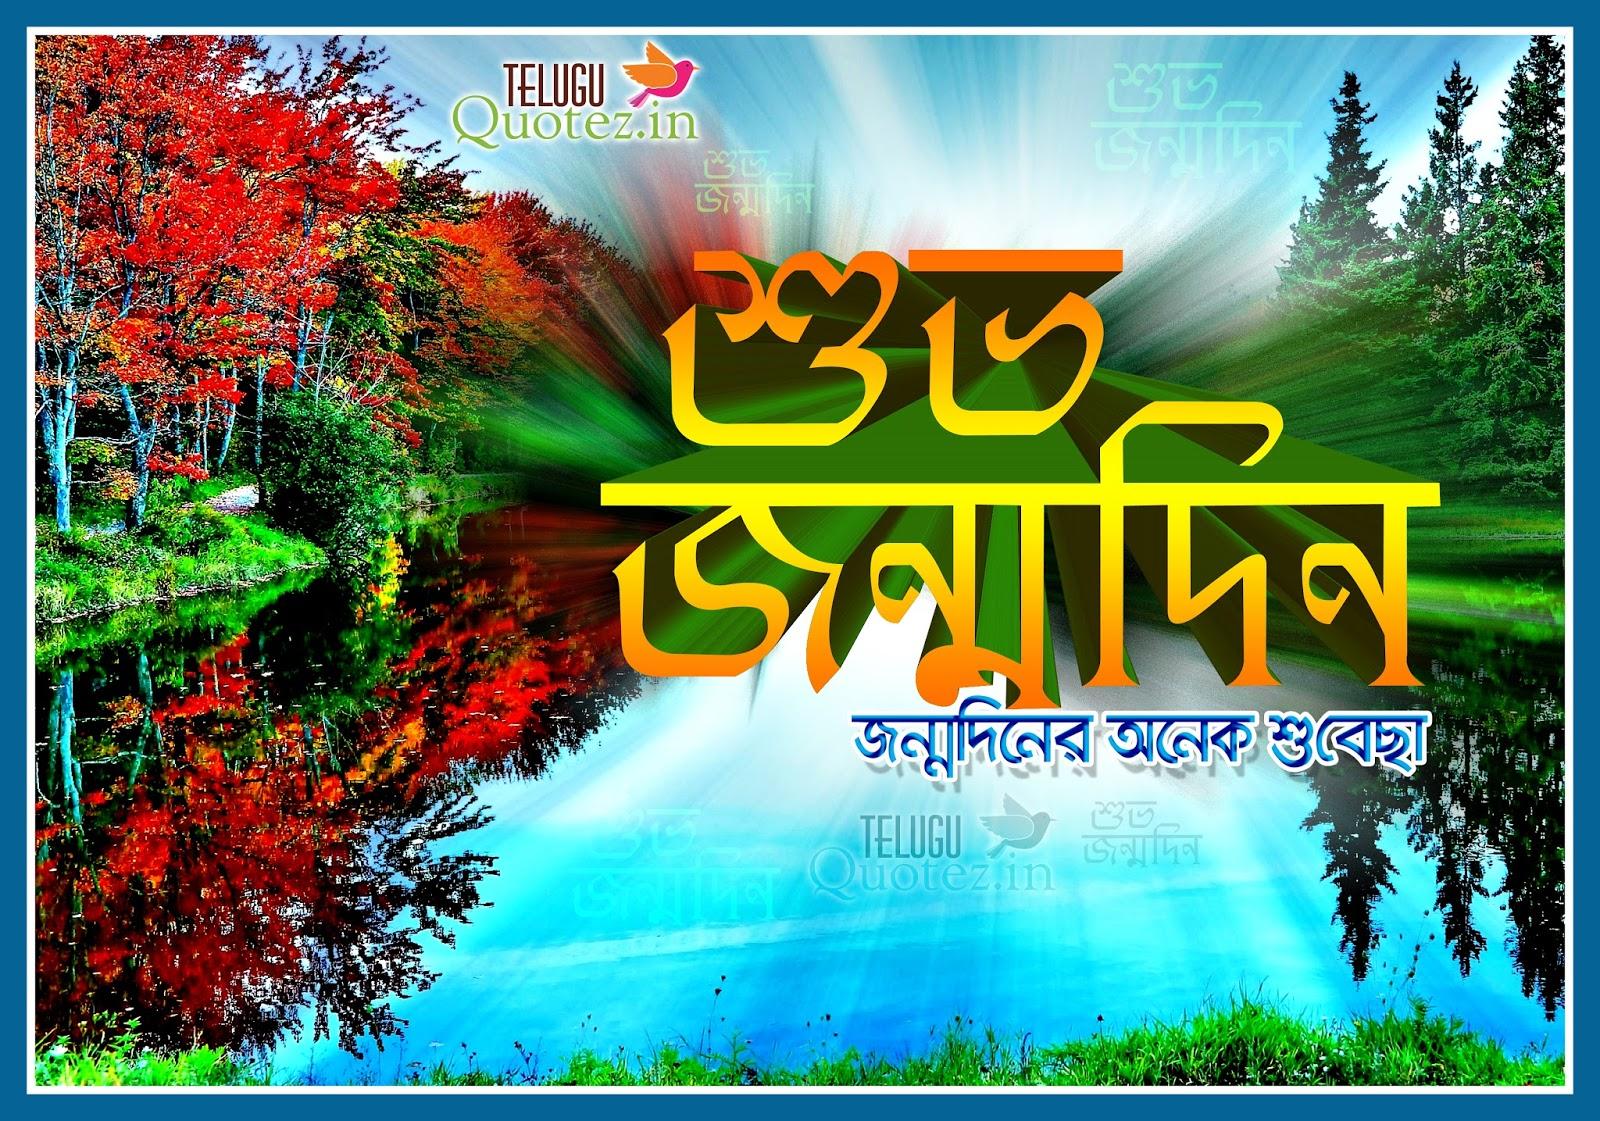 shuvo jonmodin bengali happy birthday wallpaper - Teluguquotez.in  Telugu quotes Tamil quotes ...